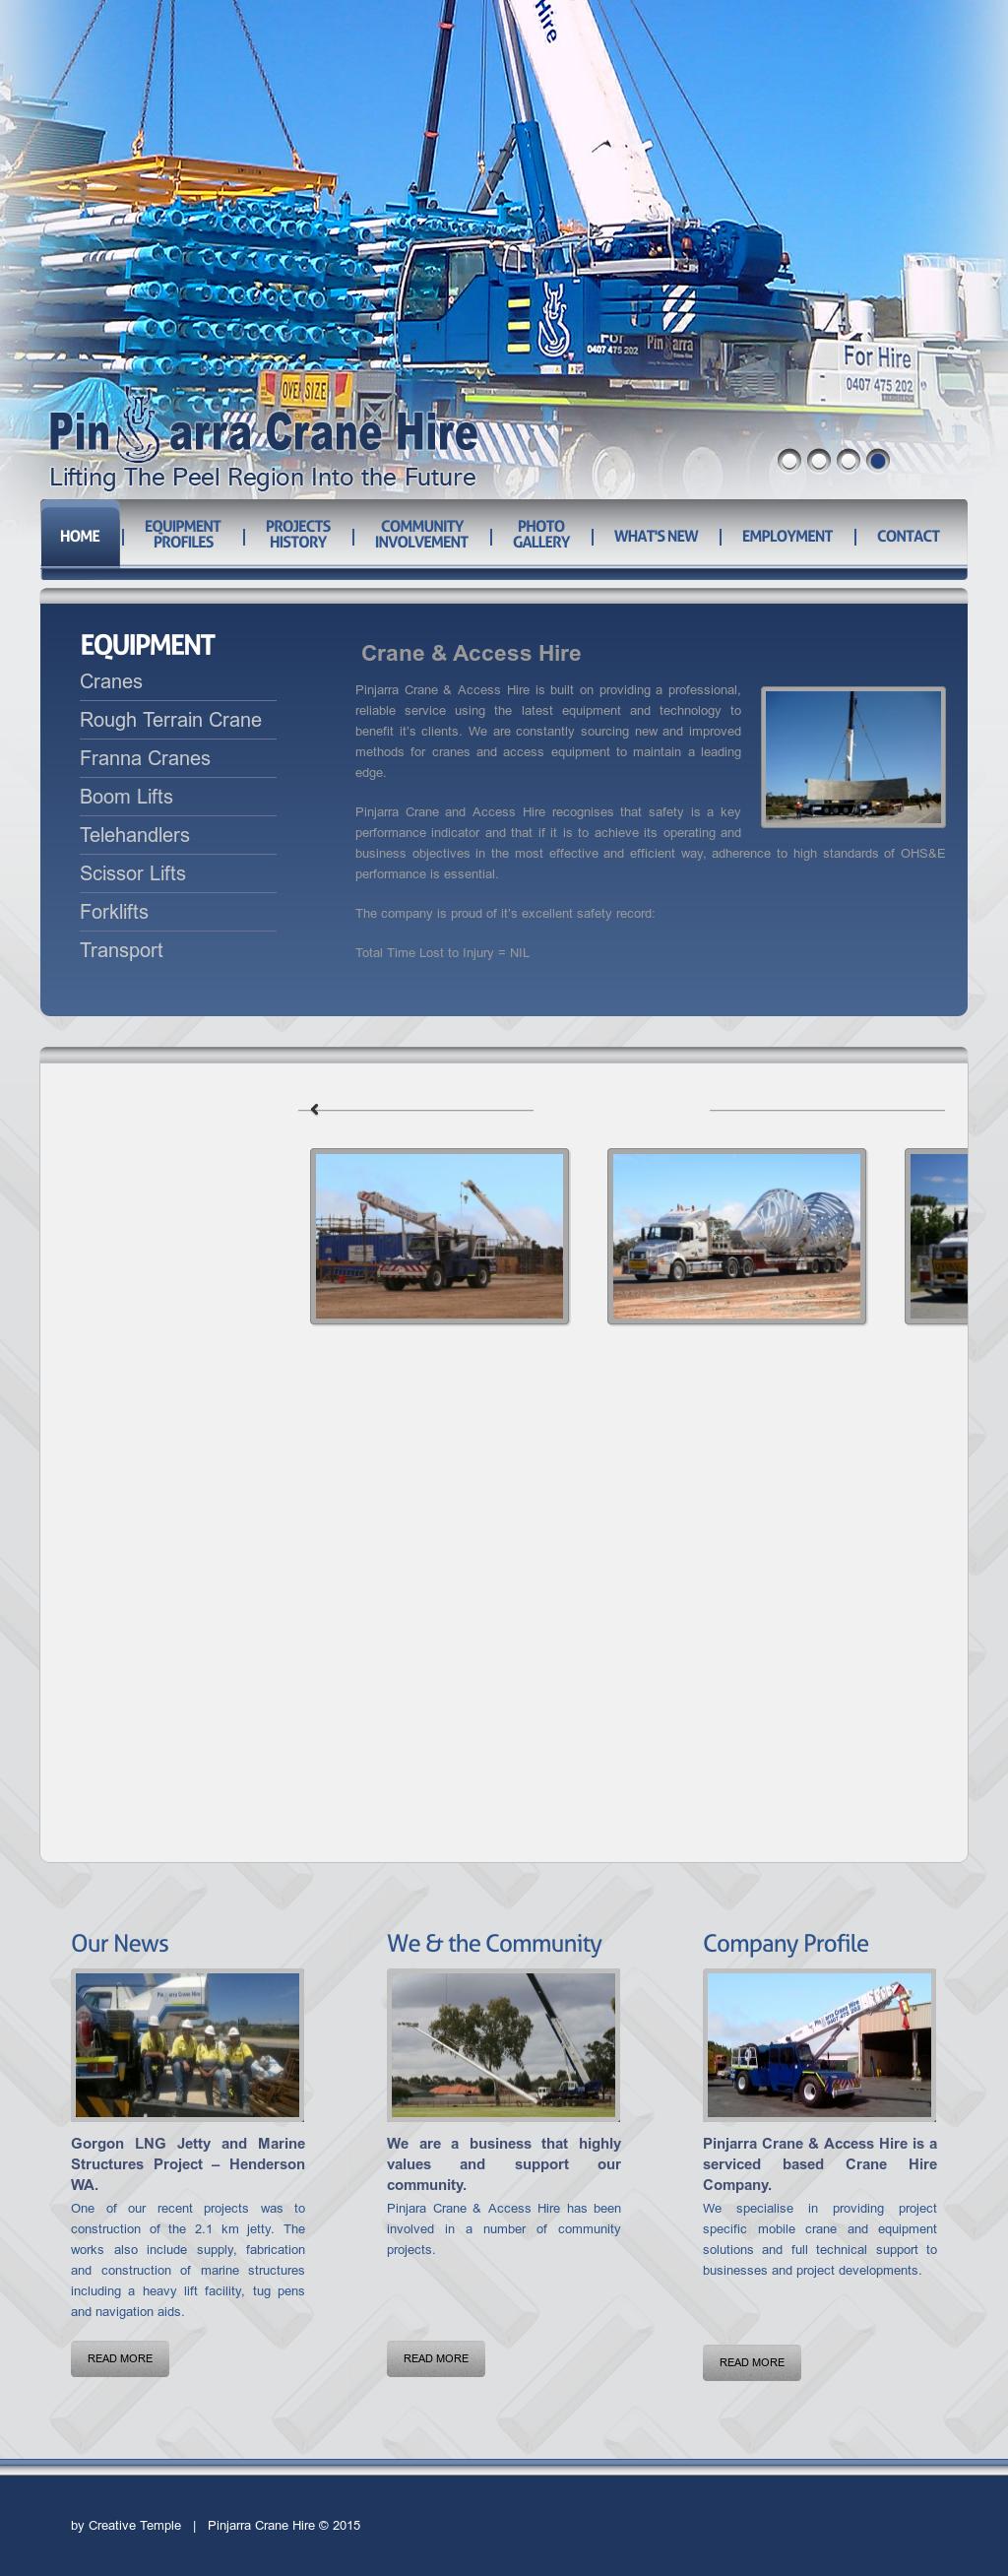 Pinjarra Crane Hire Competitors, Revenue and Employees